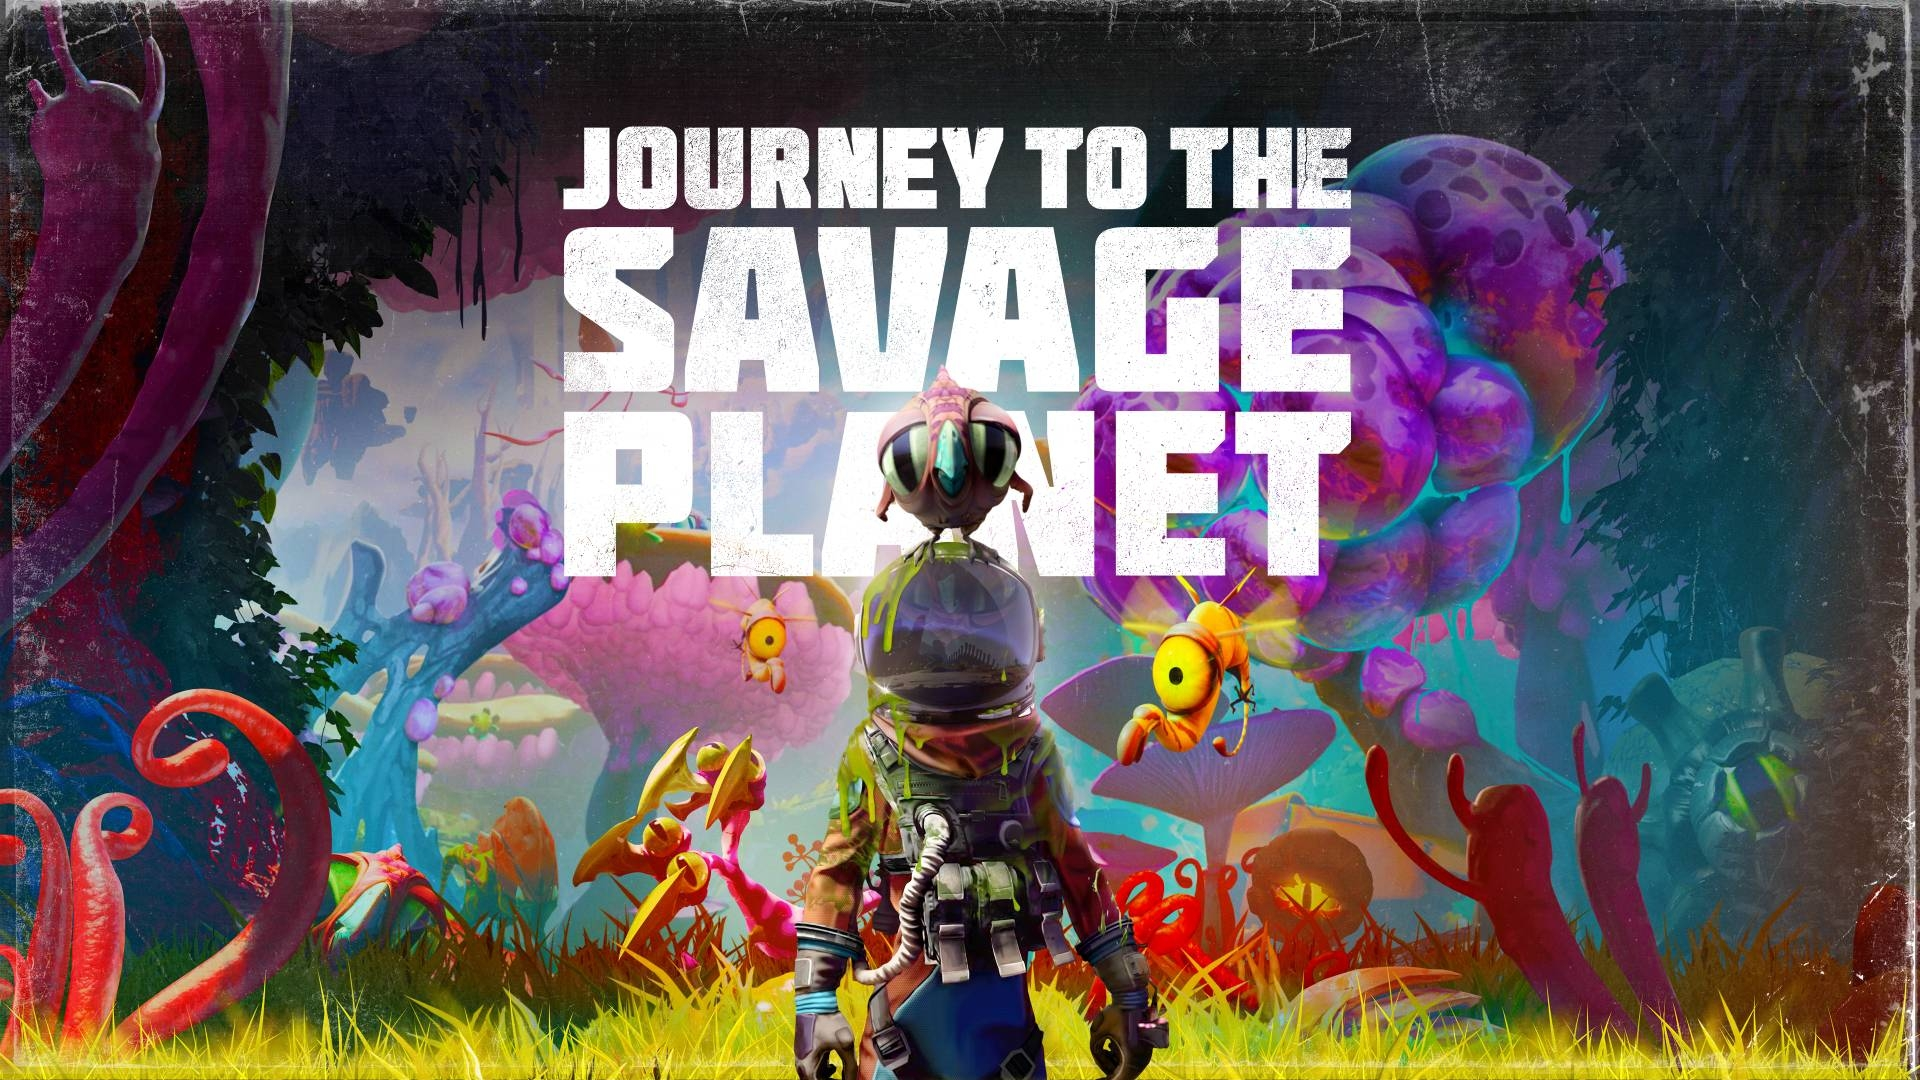 【Journey To The Savage Planet】日本語版の発売日はいつ?価格と予約特典・最新情報